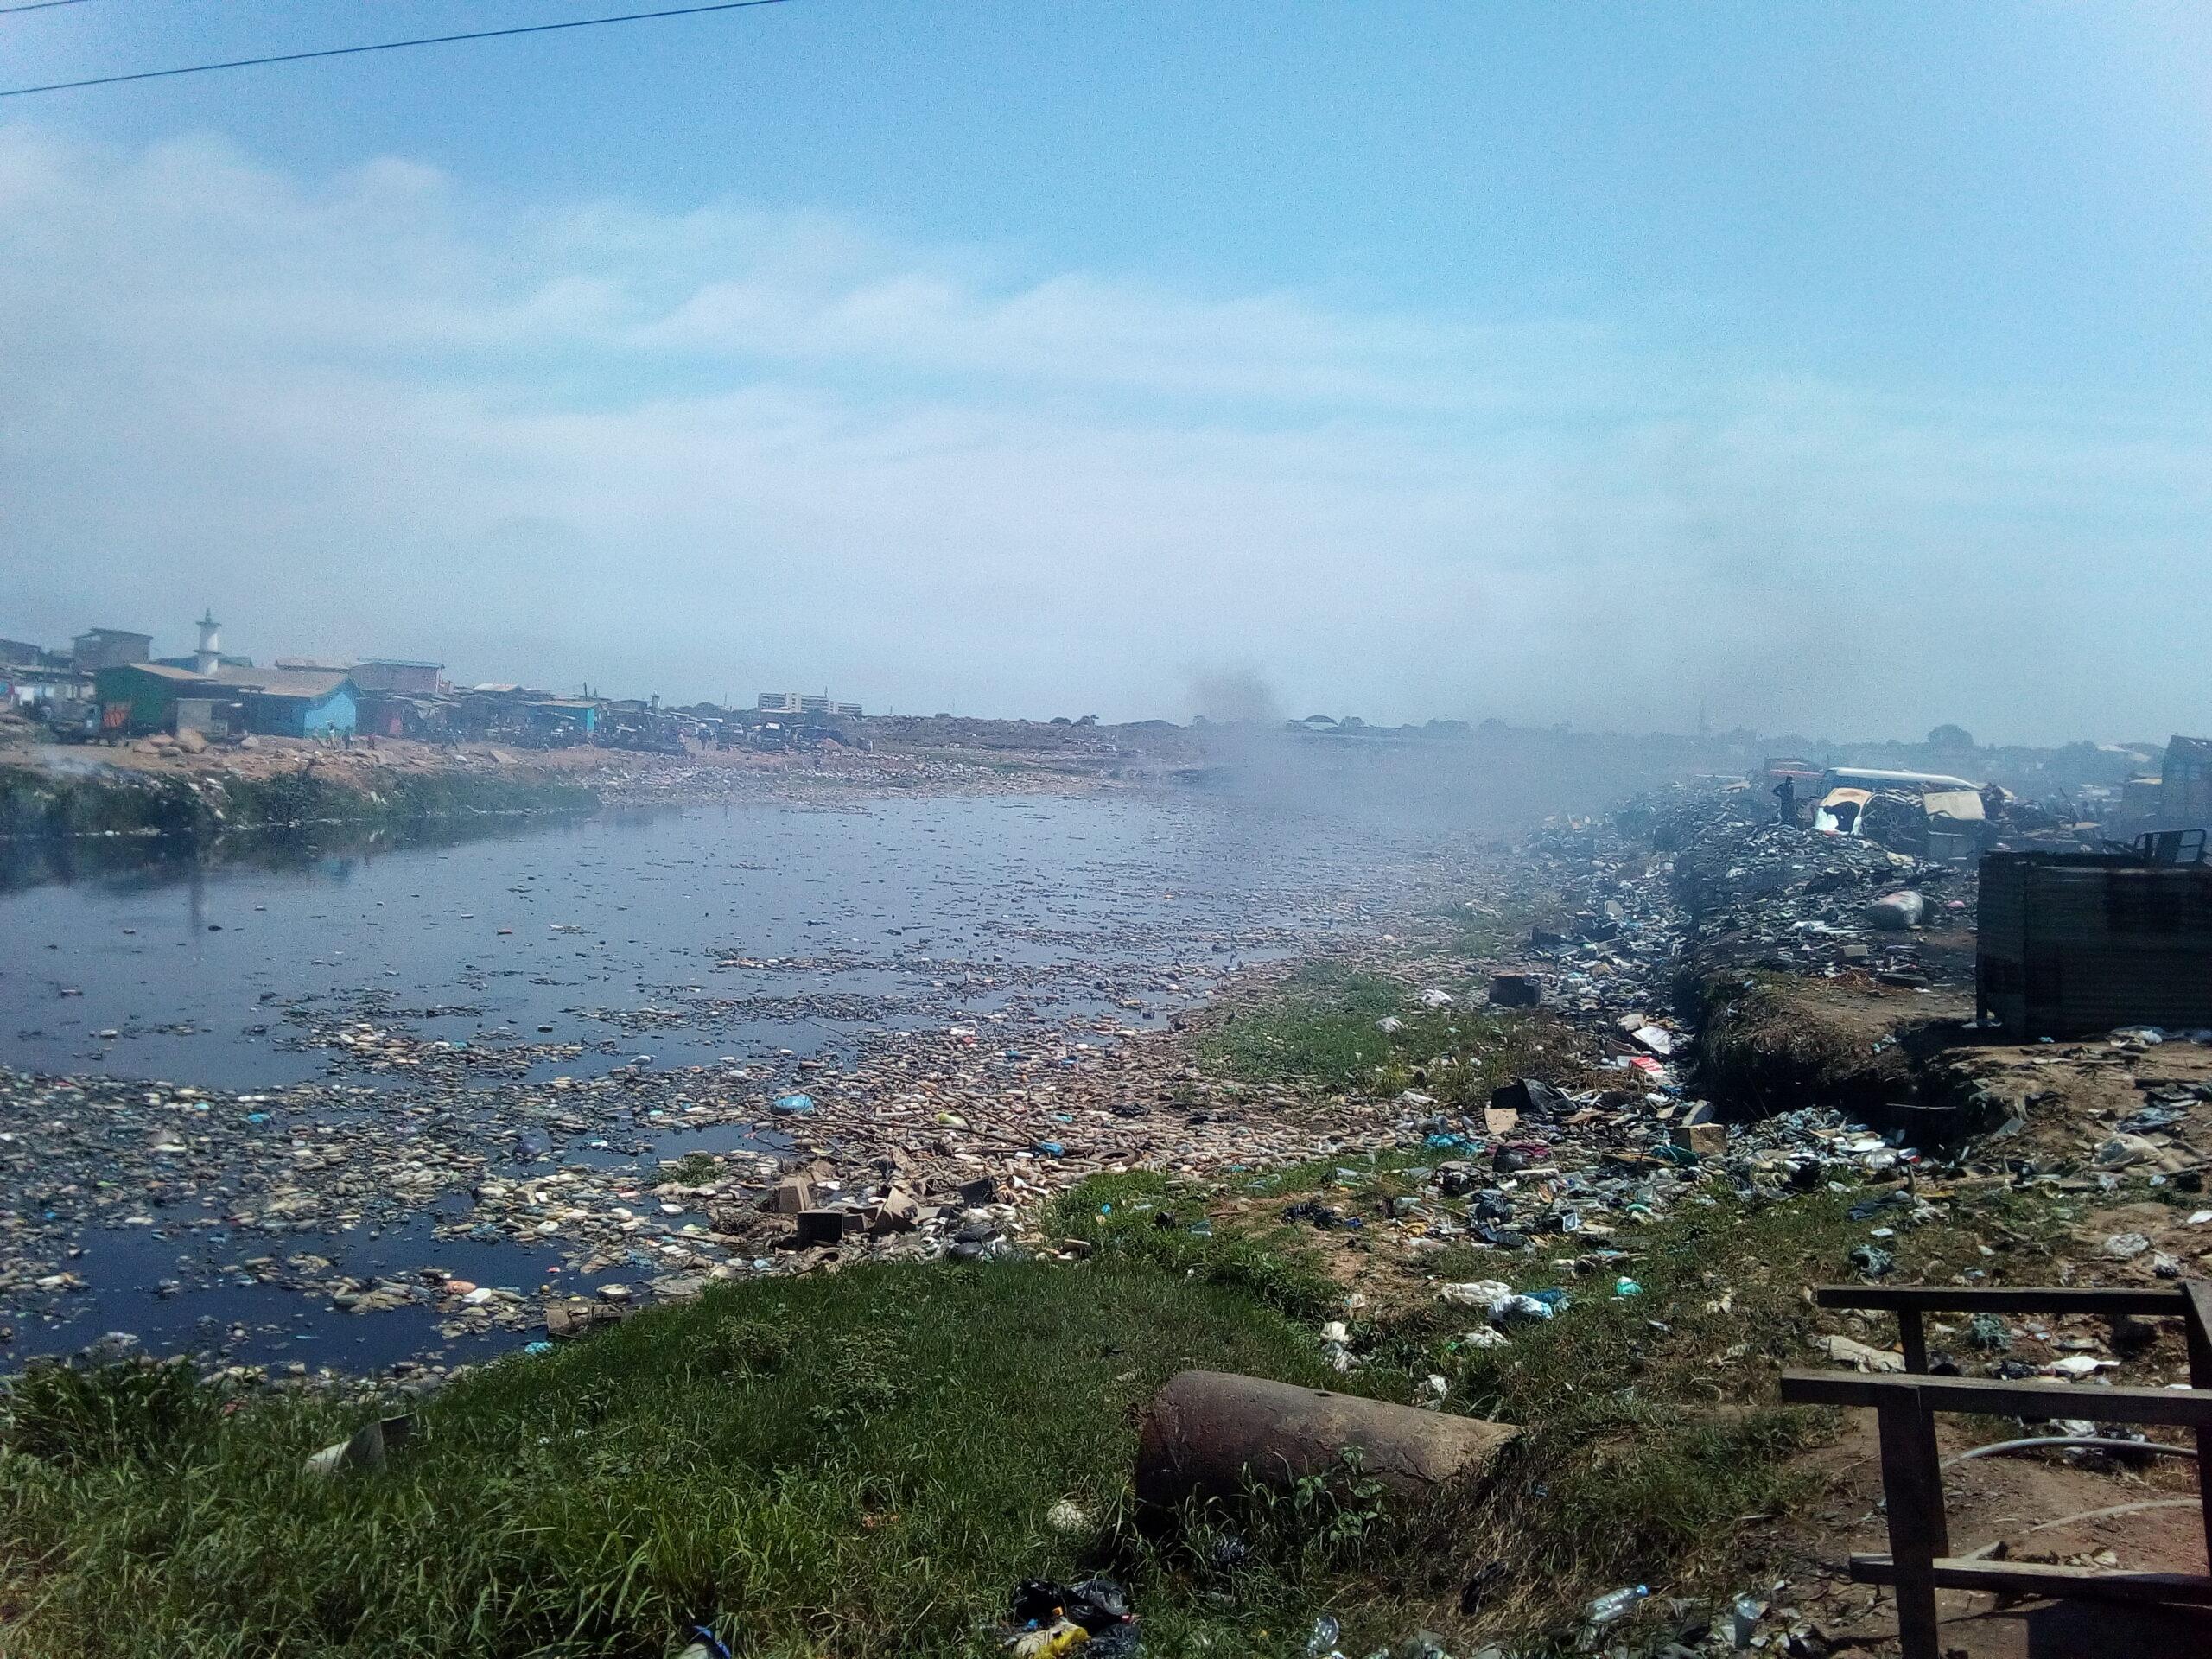 Agbogbloshie Ghana río vertedero electrónico